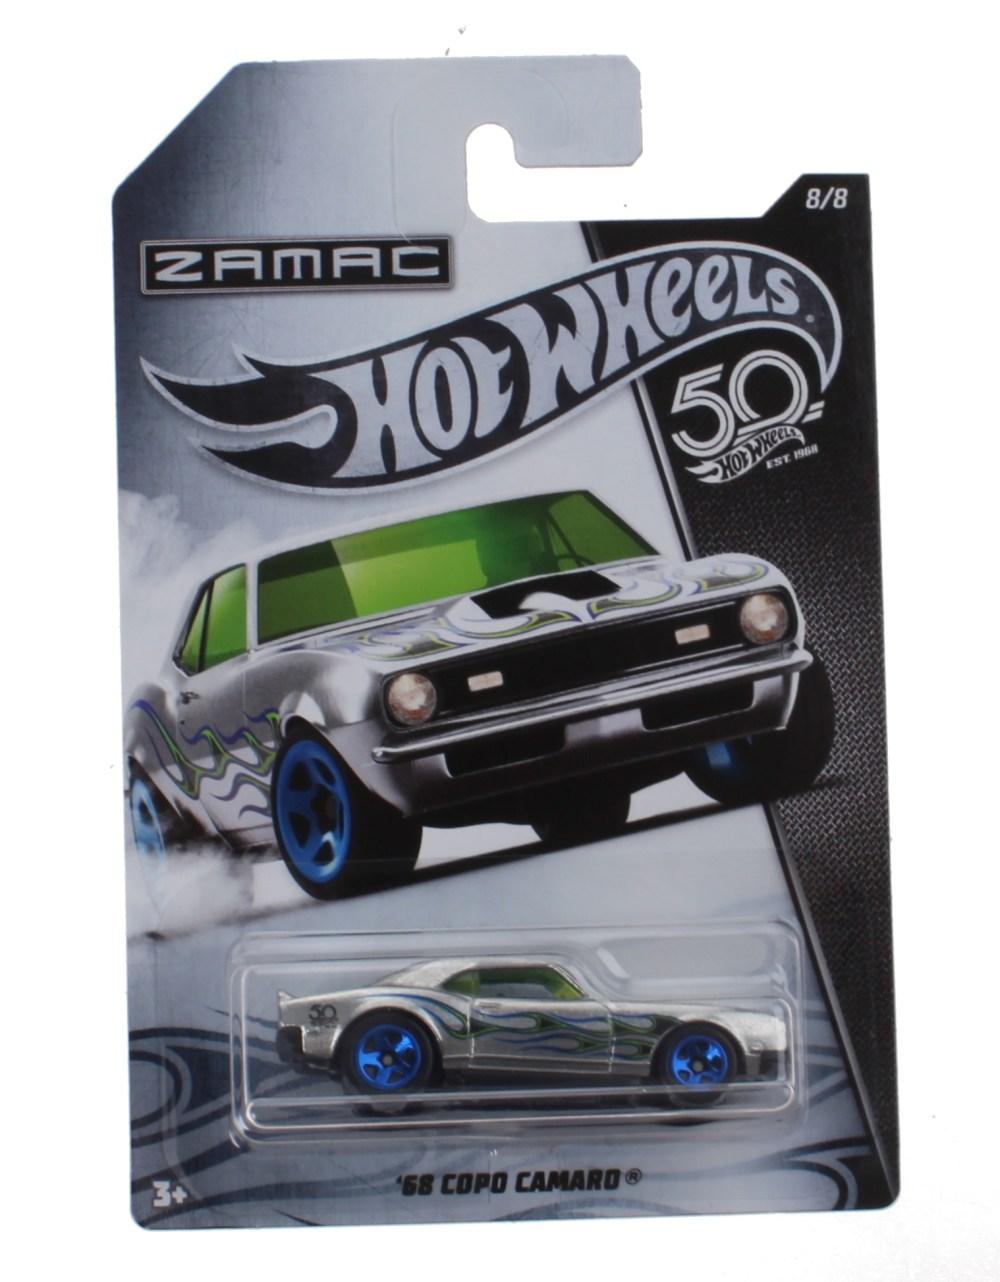 medium resolution of hot wheels zamac jubilee car 68 copo camaro silver 7 5 cm